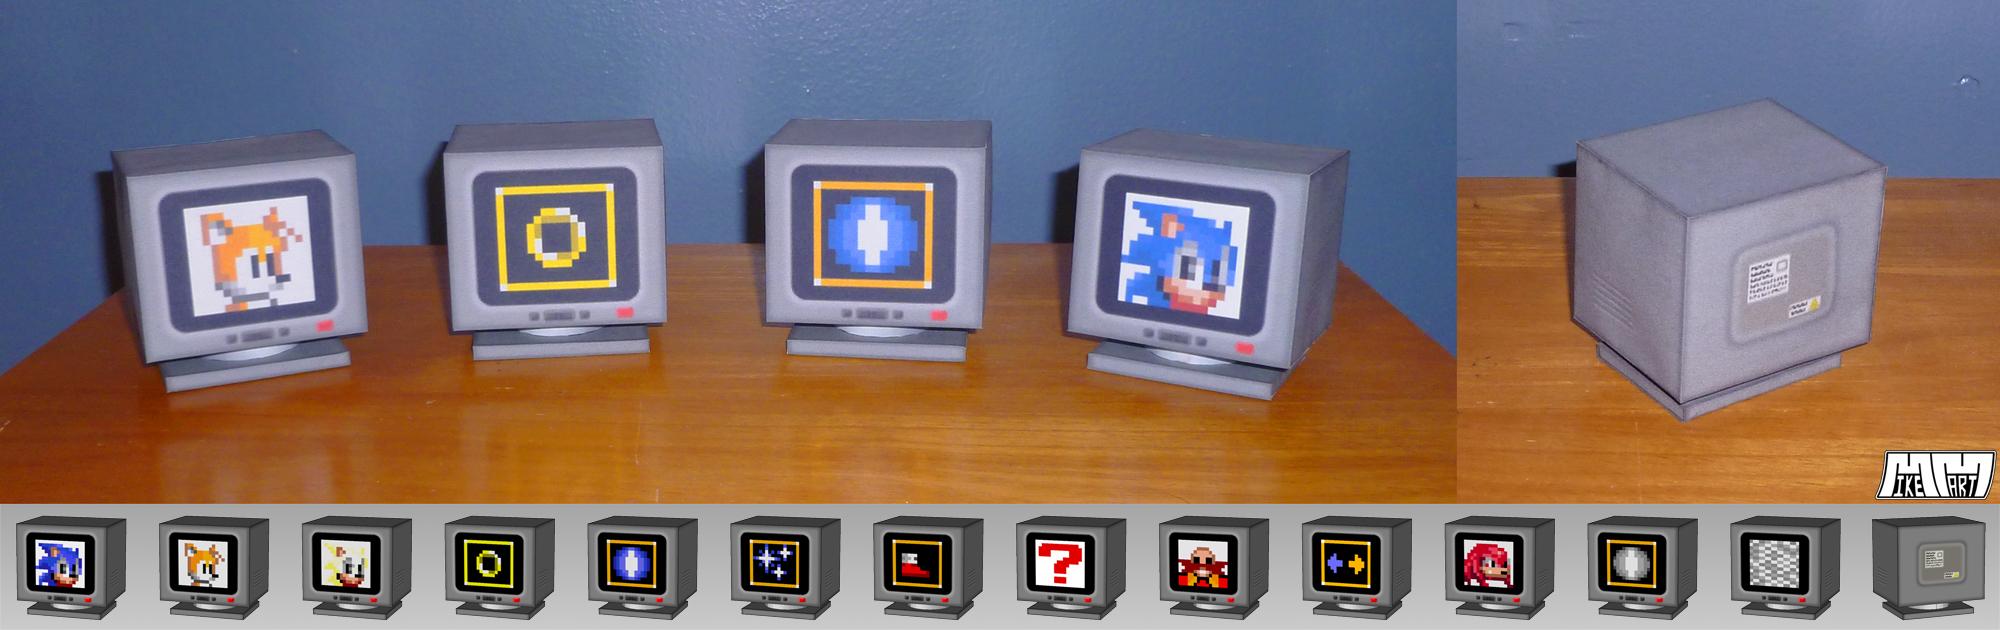 Sonic 2 Item Boxes Assembled